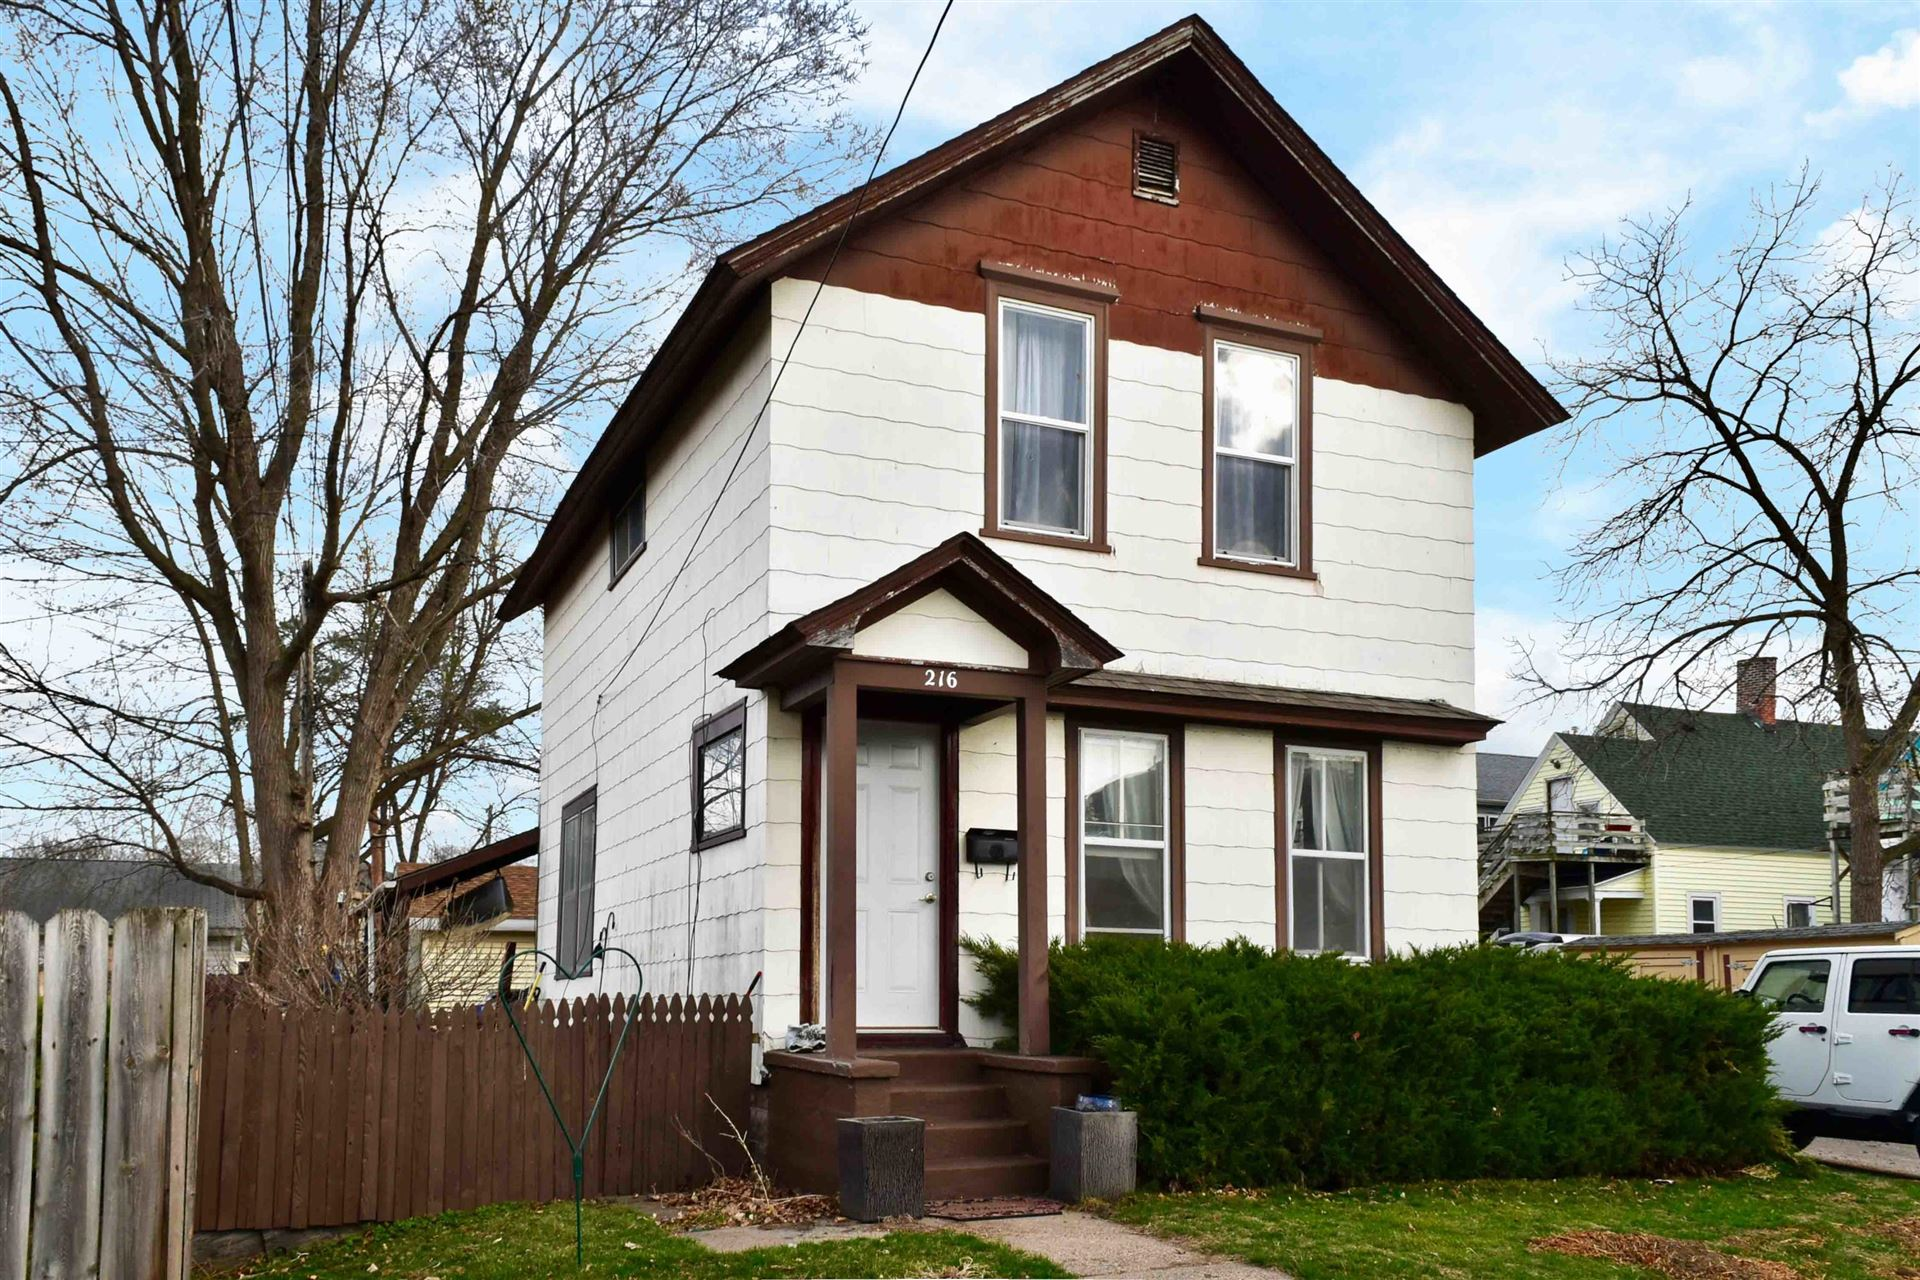 216 Olmstead St, Winona, MN 55987 - MLS#: 1733789